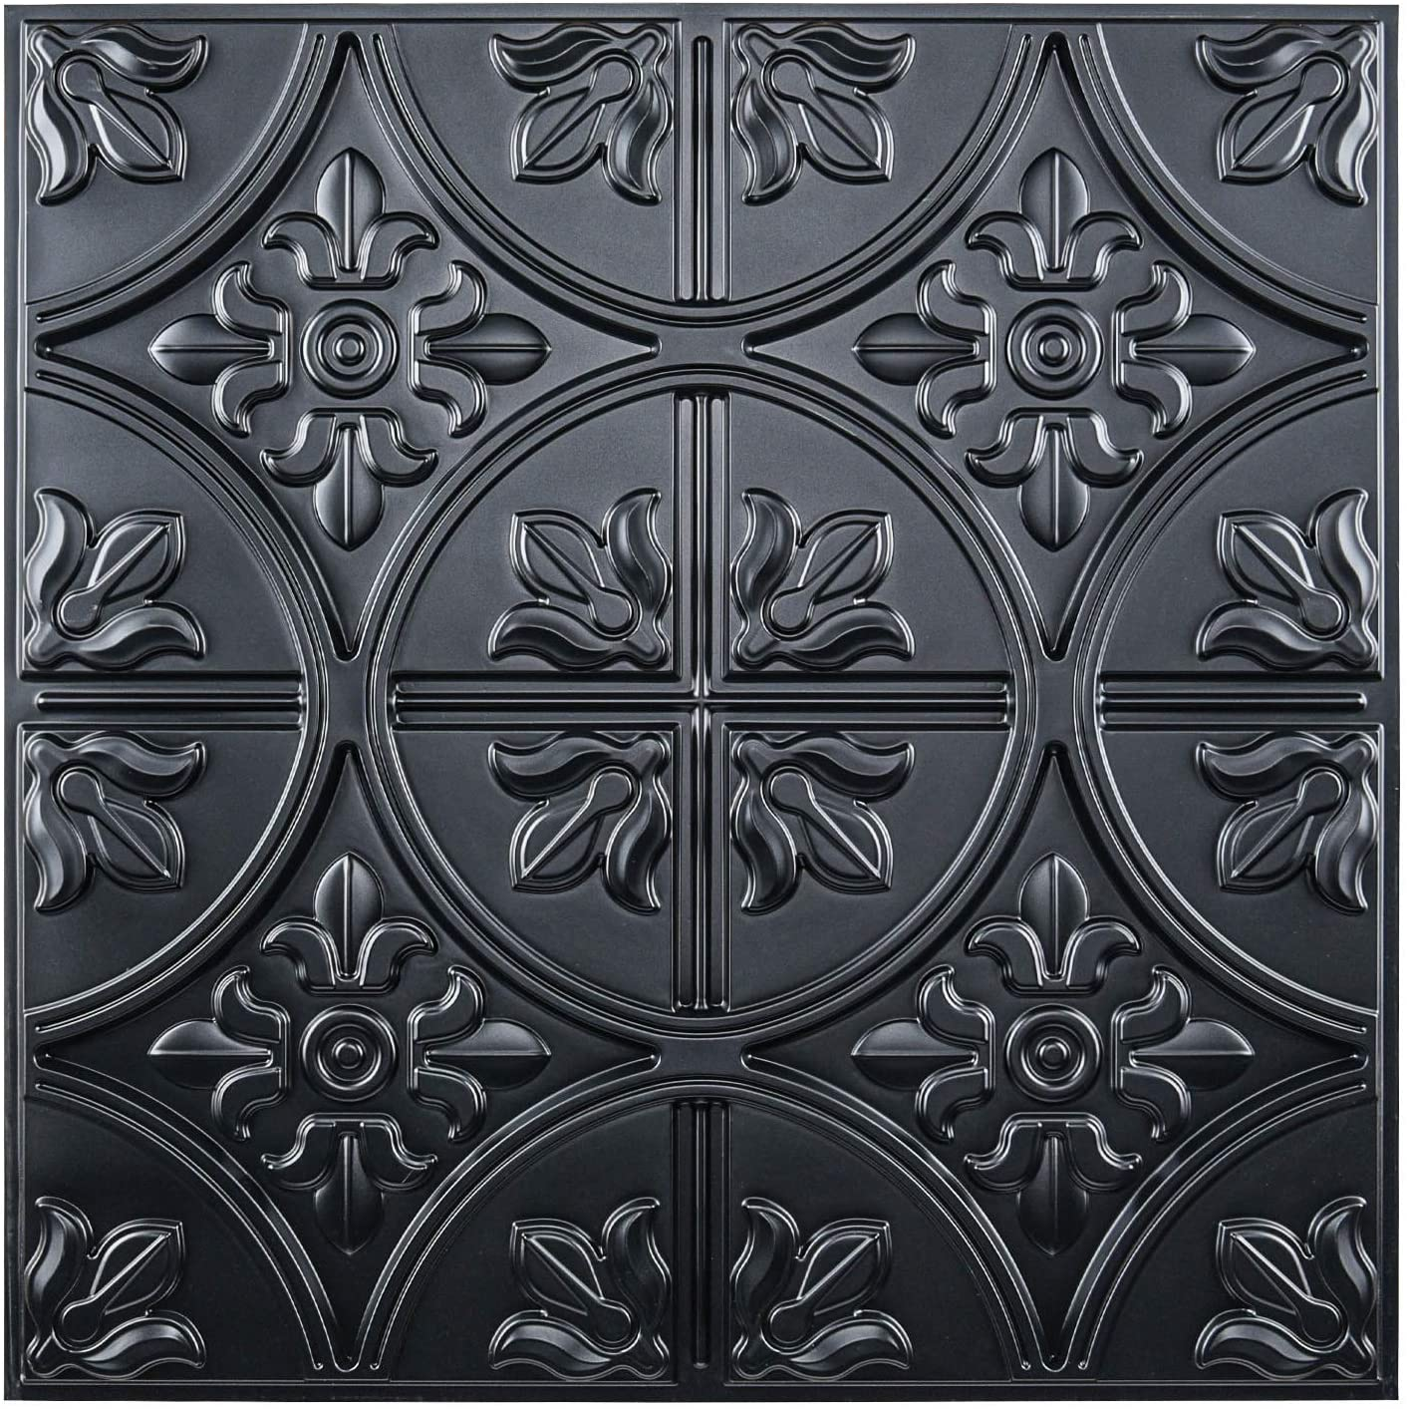 Art3d Drop lowest price Ceiling Mesa Mall Tiles 2x2 Class Glue-up Fancy Panel